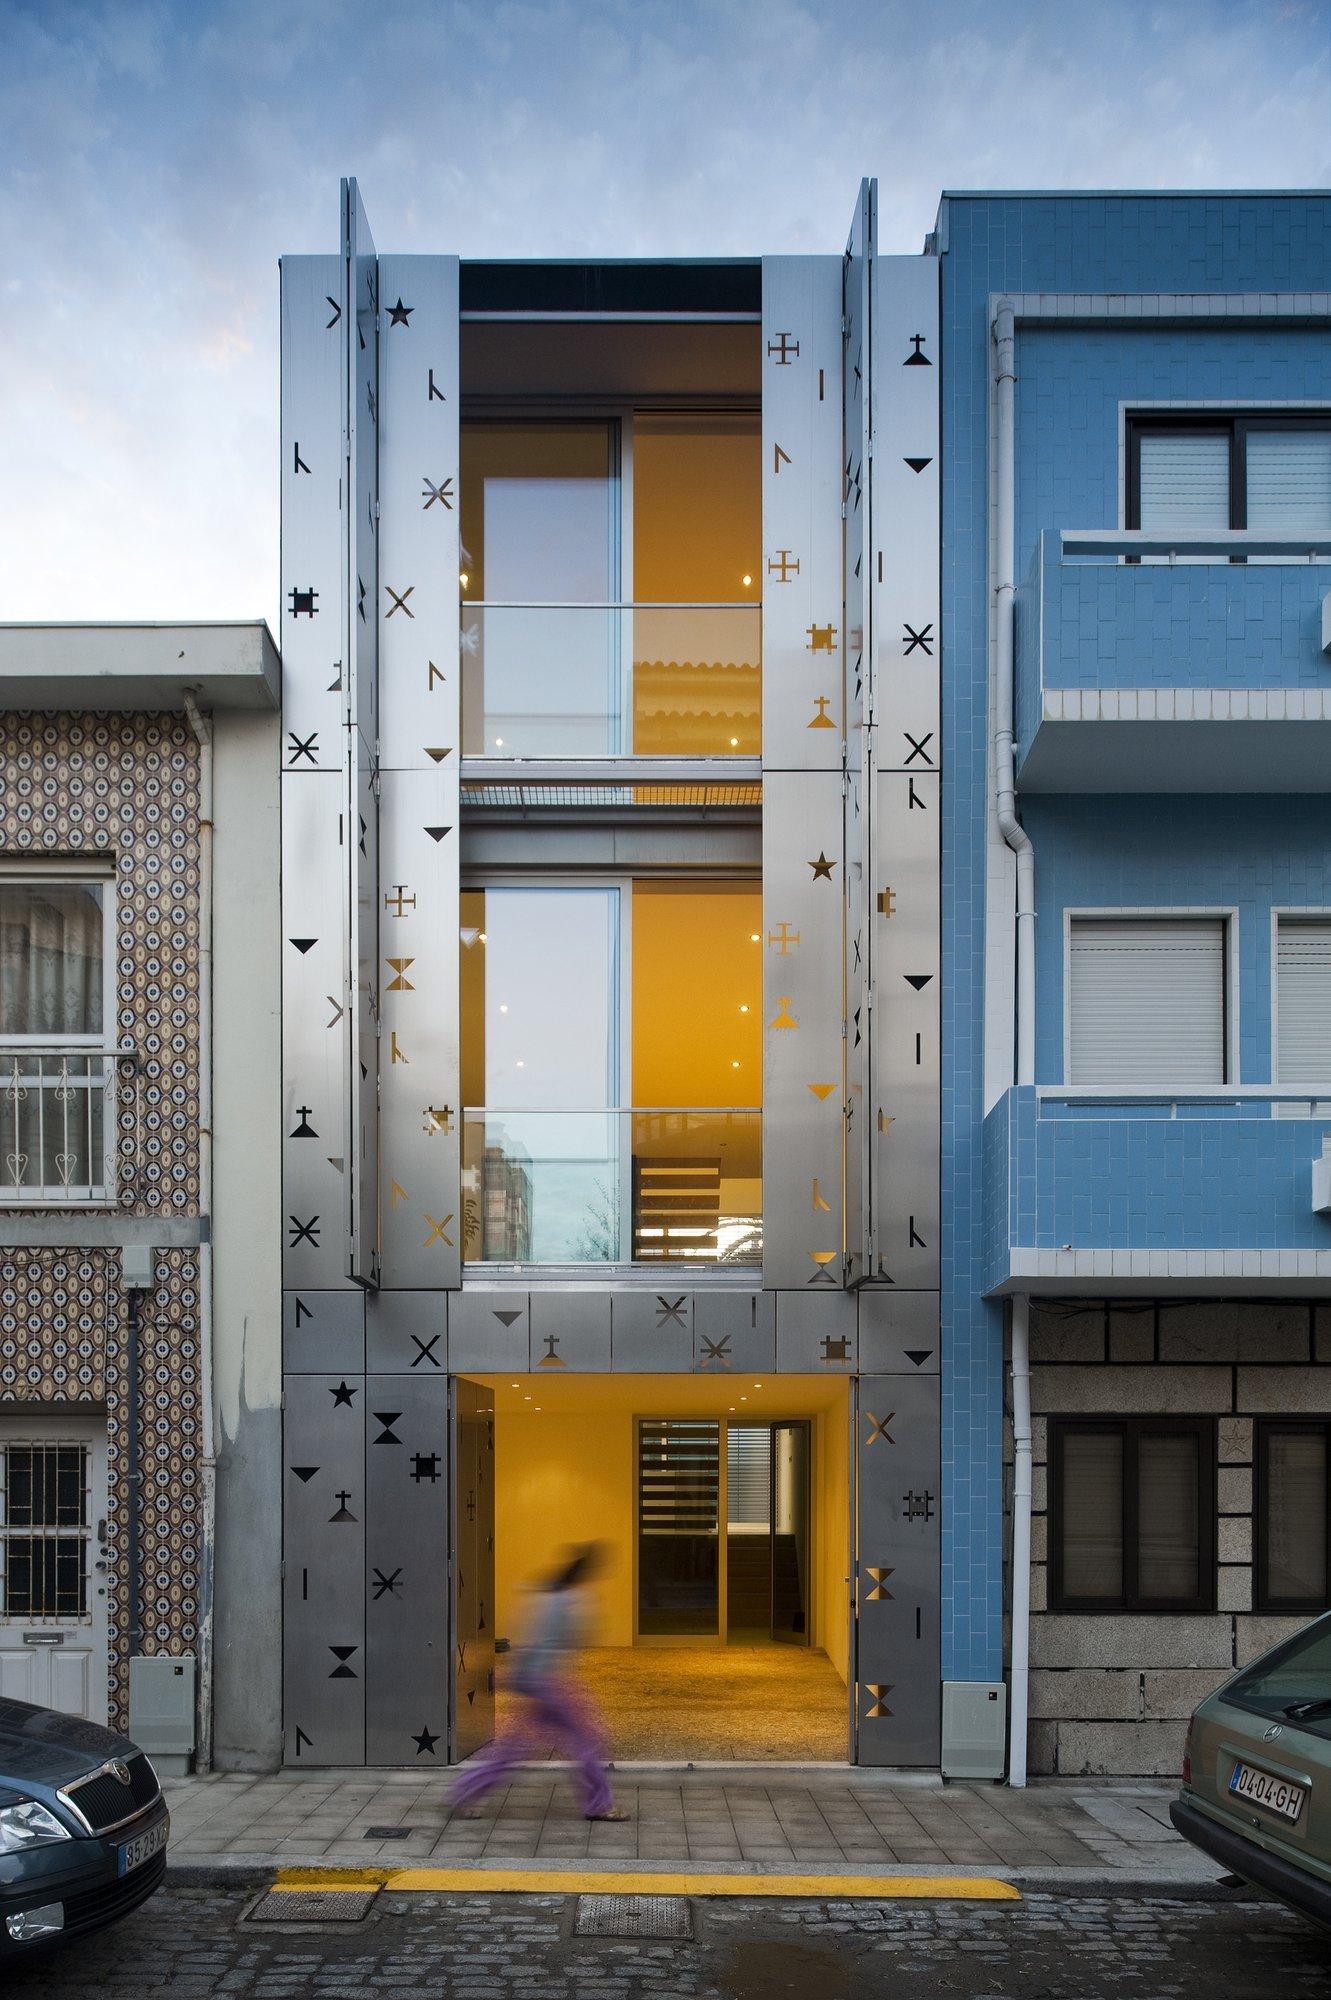 77 Best Images About Cartomancy On Pinterest: Plataforma Arquitectura